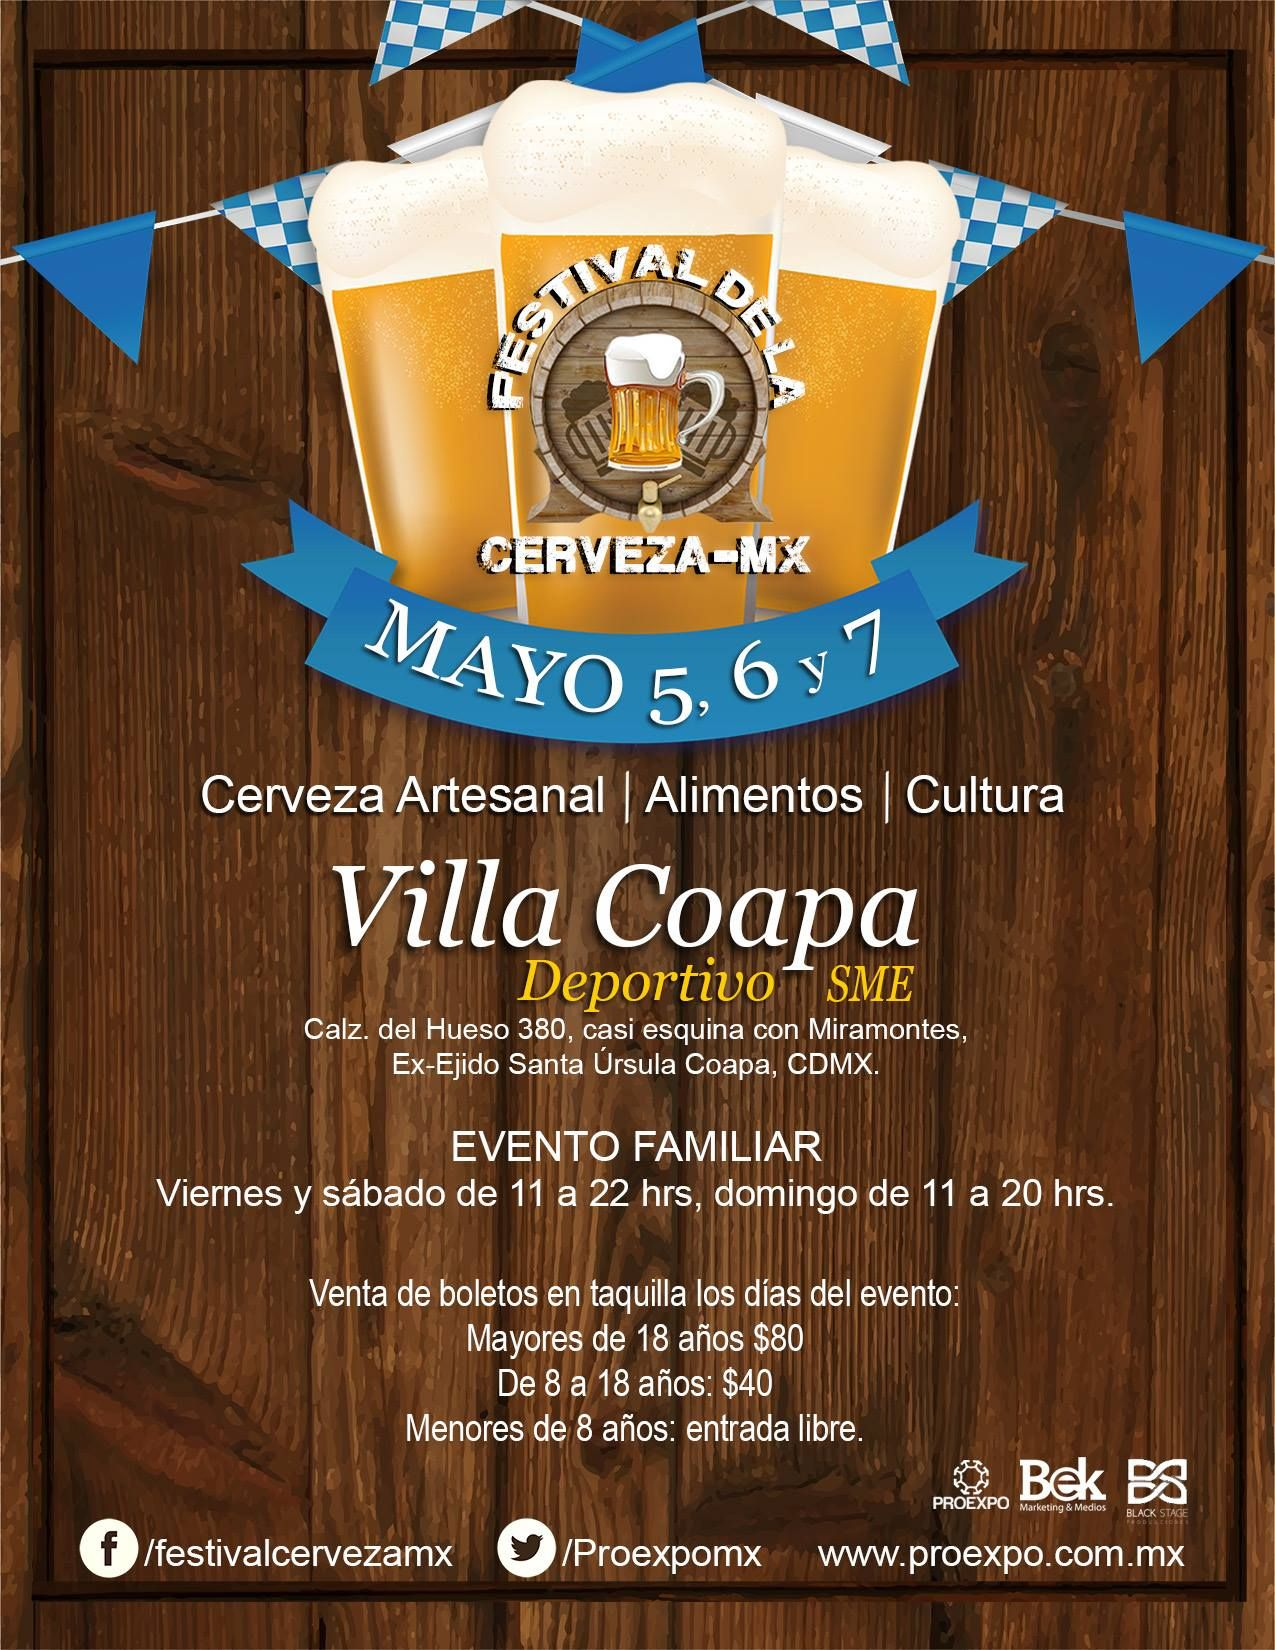 Festival de la Cerveza CDMX 5 7 mayo 2017